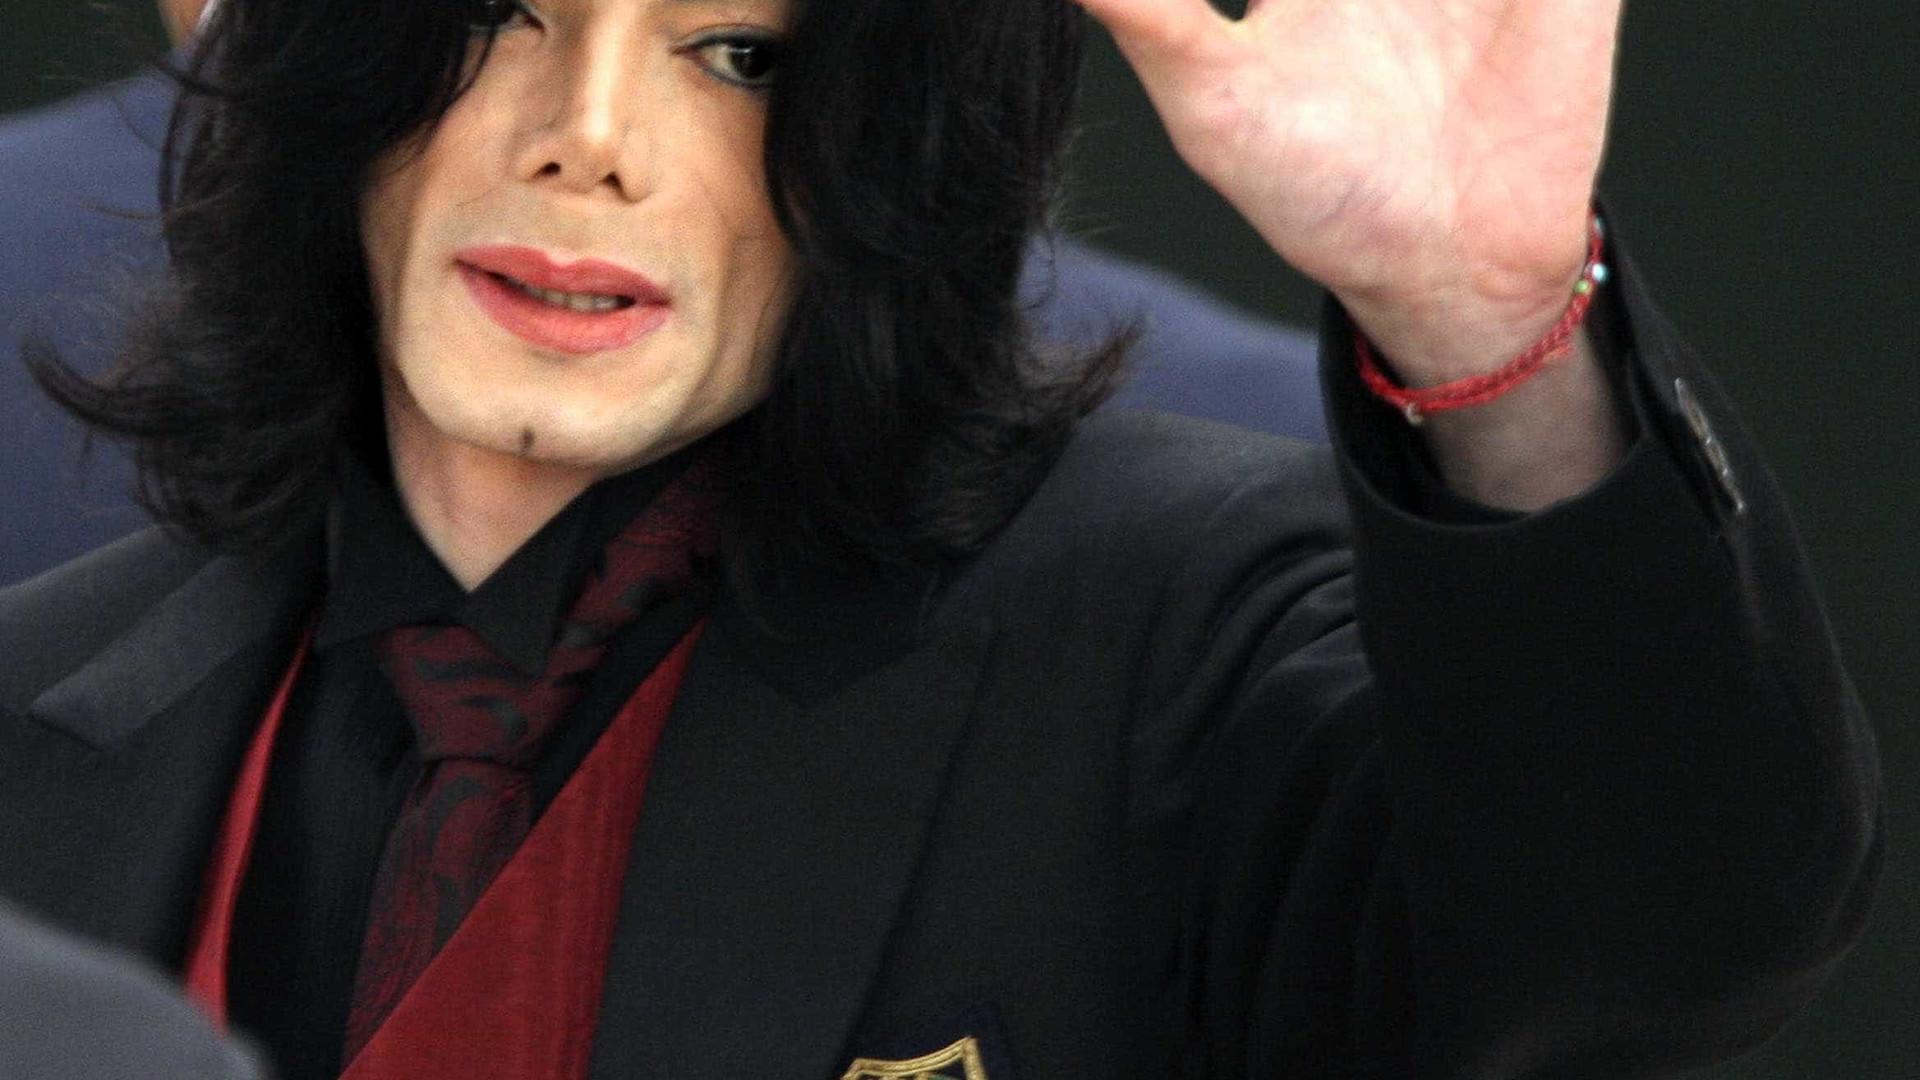 Estrela de Michael Jackson no Passeio da Fama vandalizada